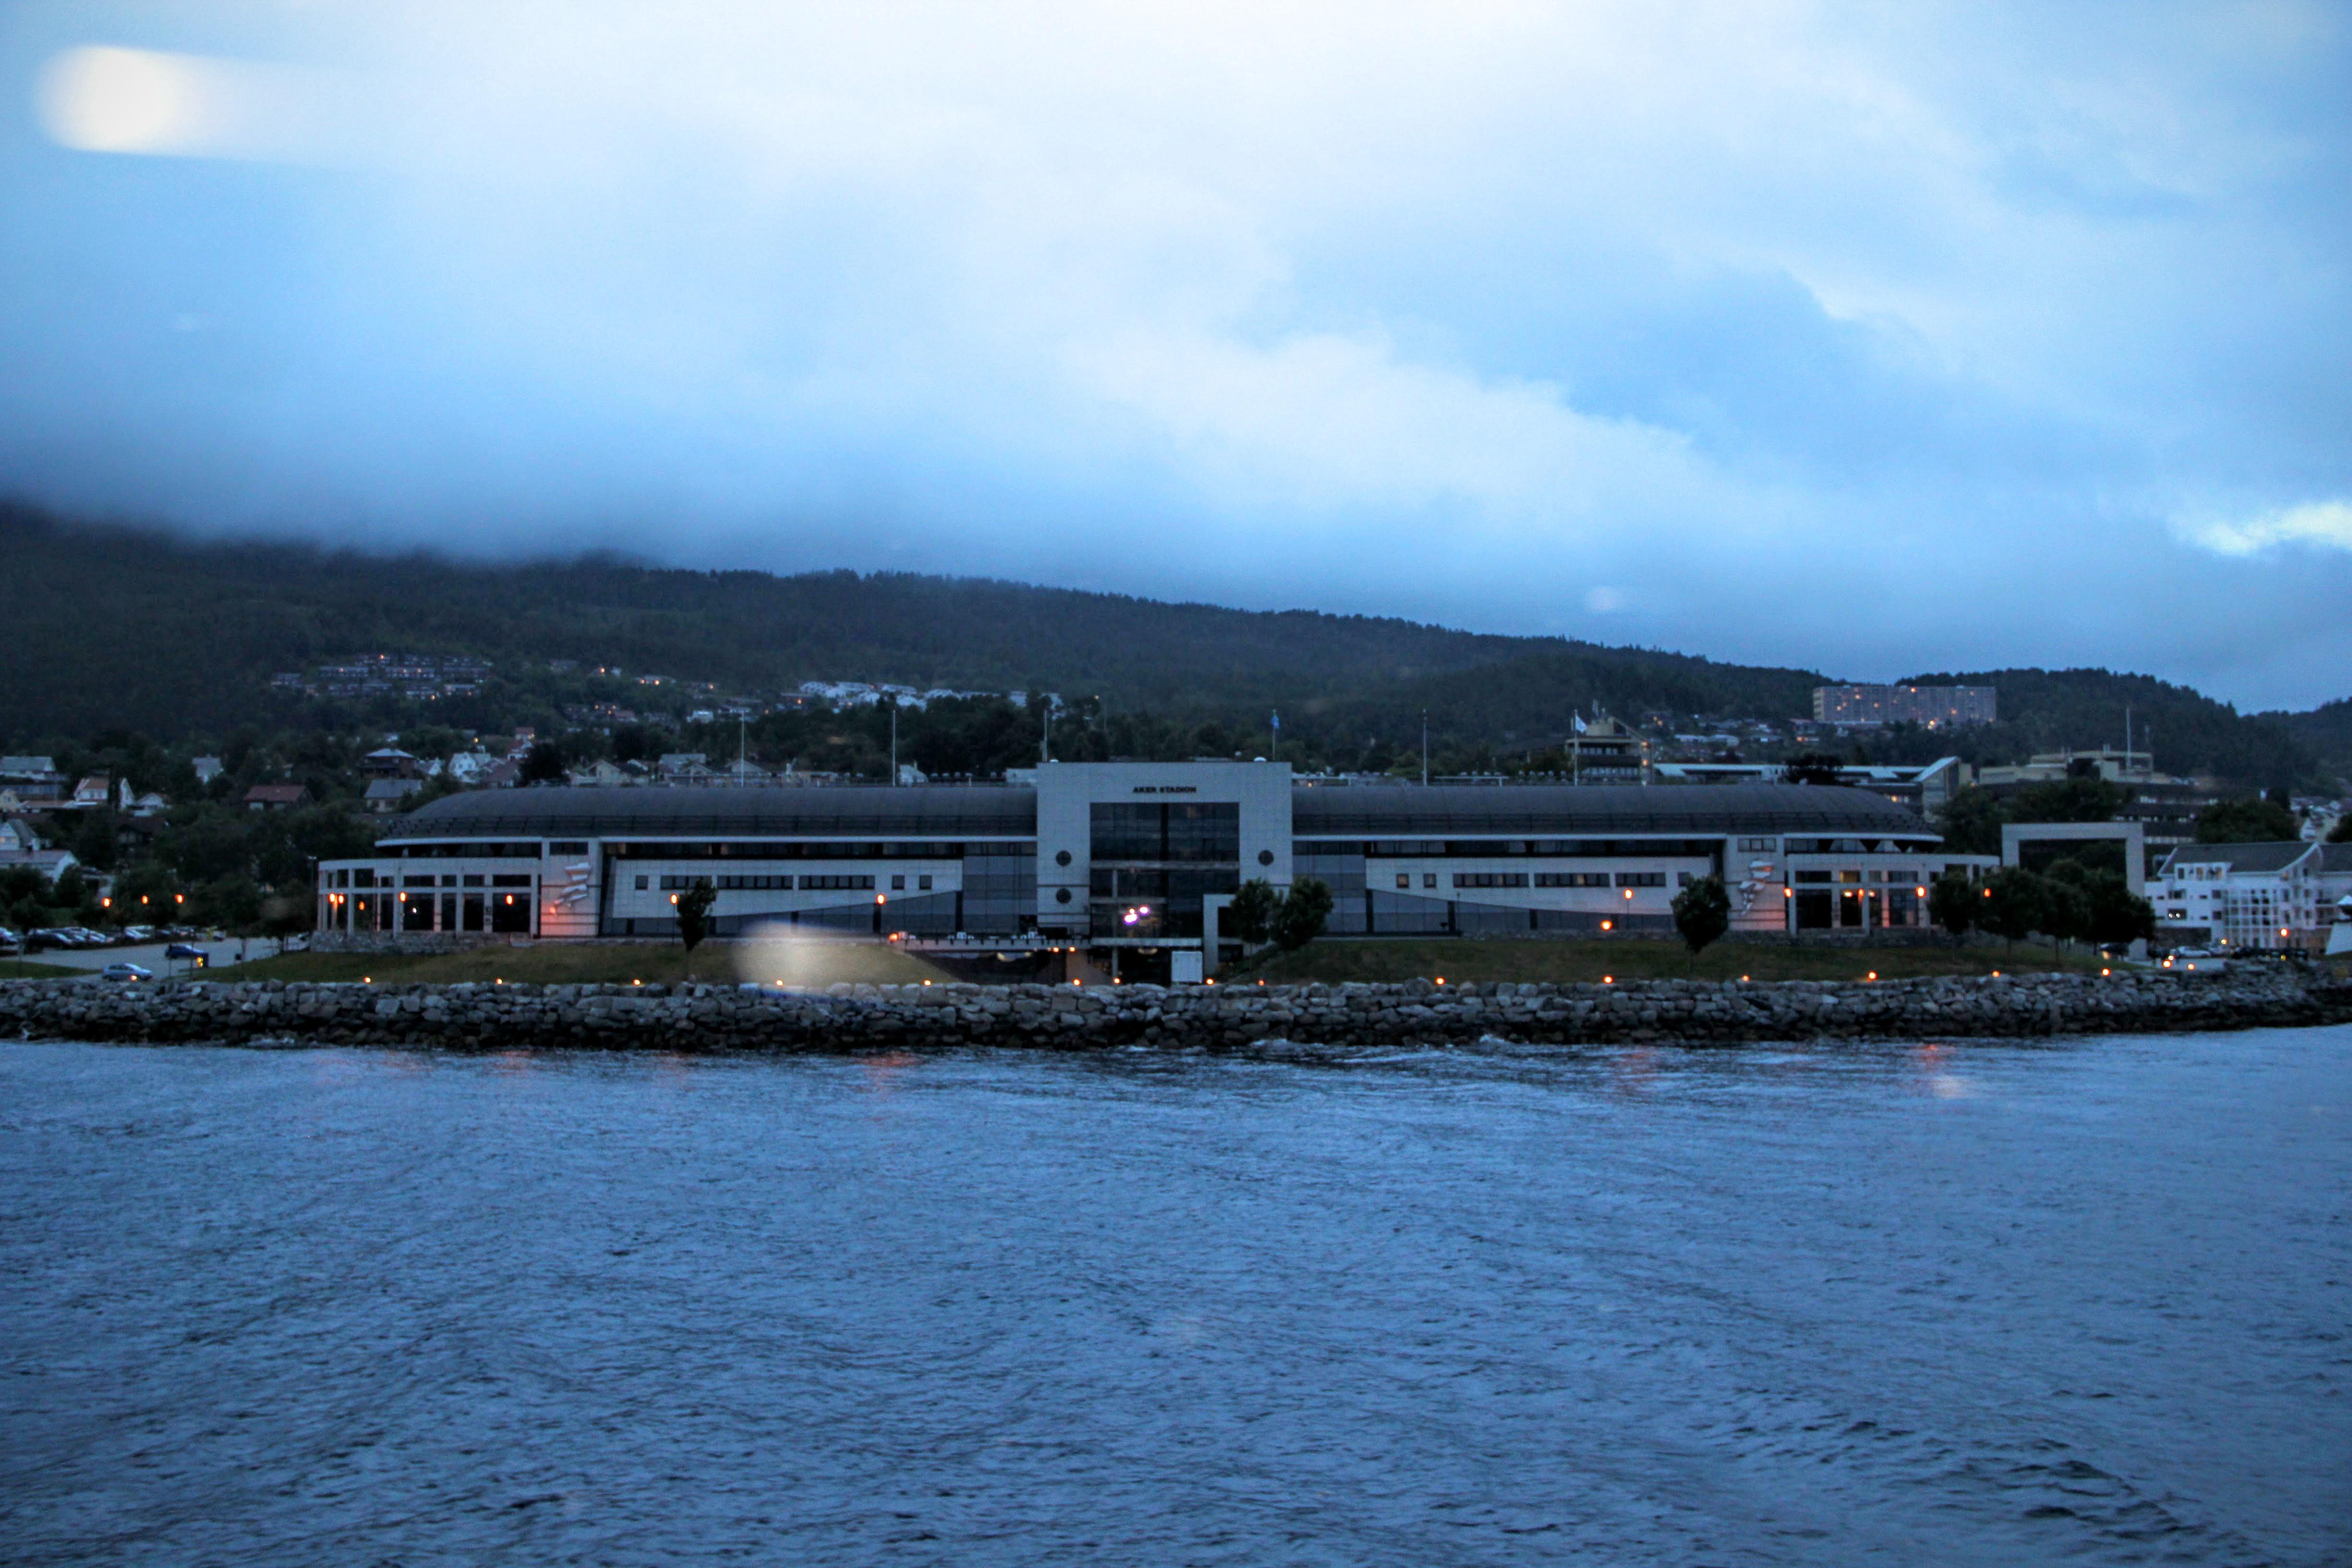 Le stade Aker de Molde